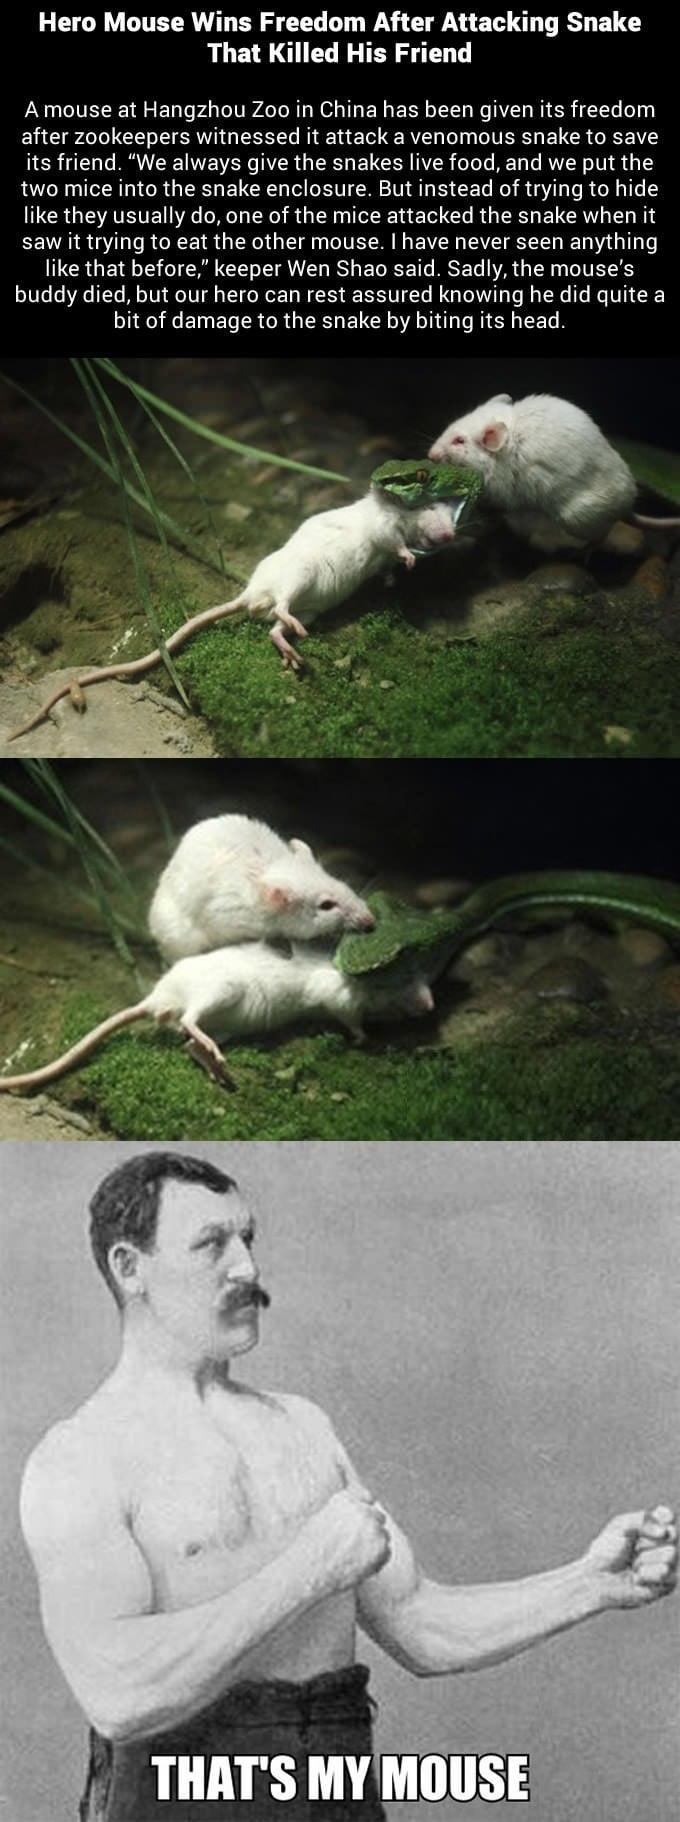 Imagini amuzante si haioase - Brave little guy